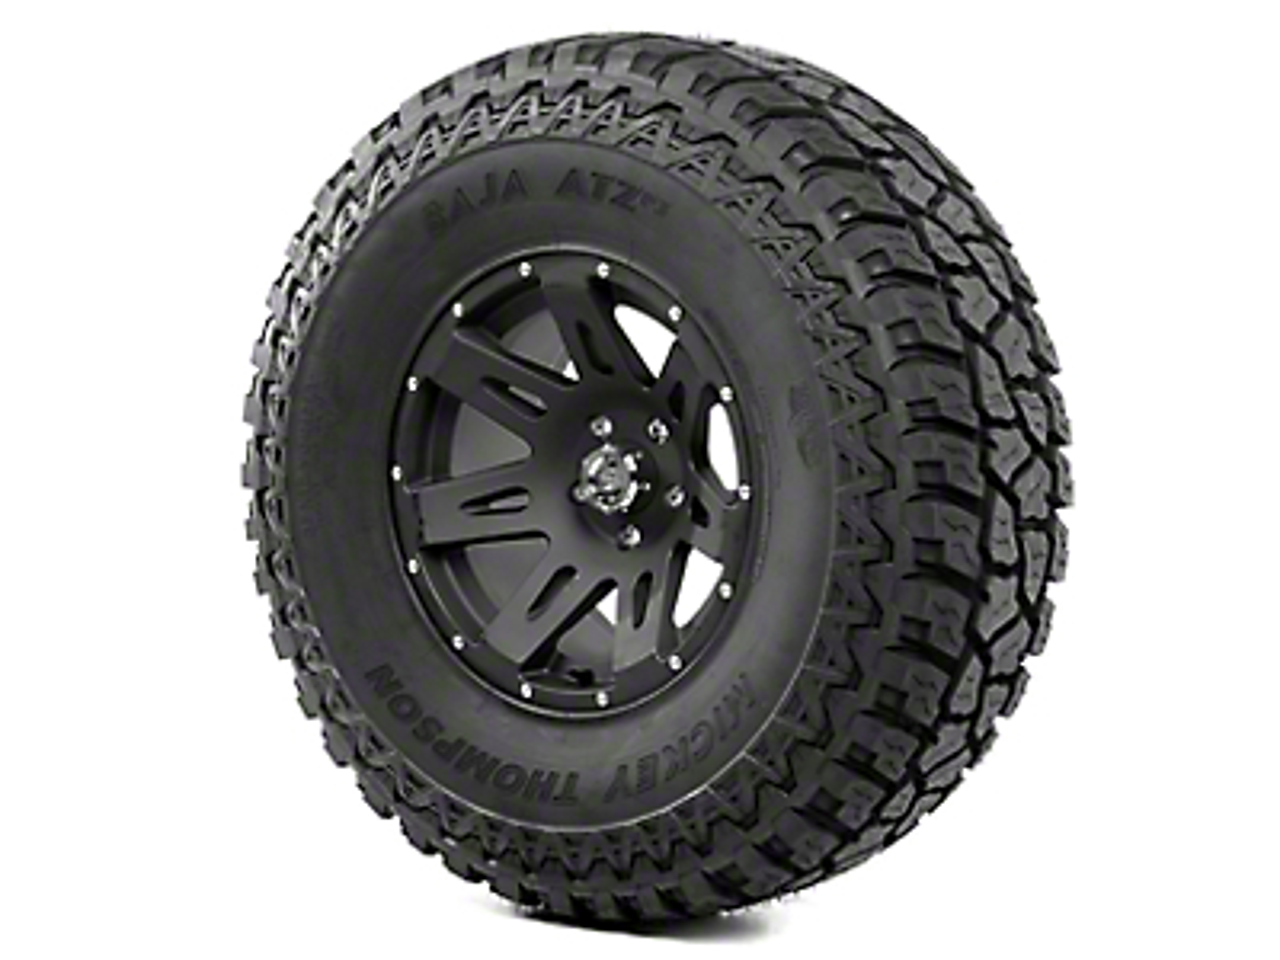 Rugged Ridge XHD Wheel 17x9 Black Satin and Mickey Thompson ATZ P3 37x12.50x17 Tire Kit (07-12 Jeep Wrangler JK)